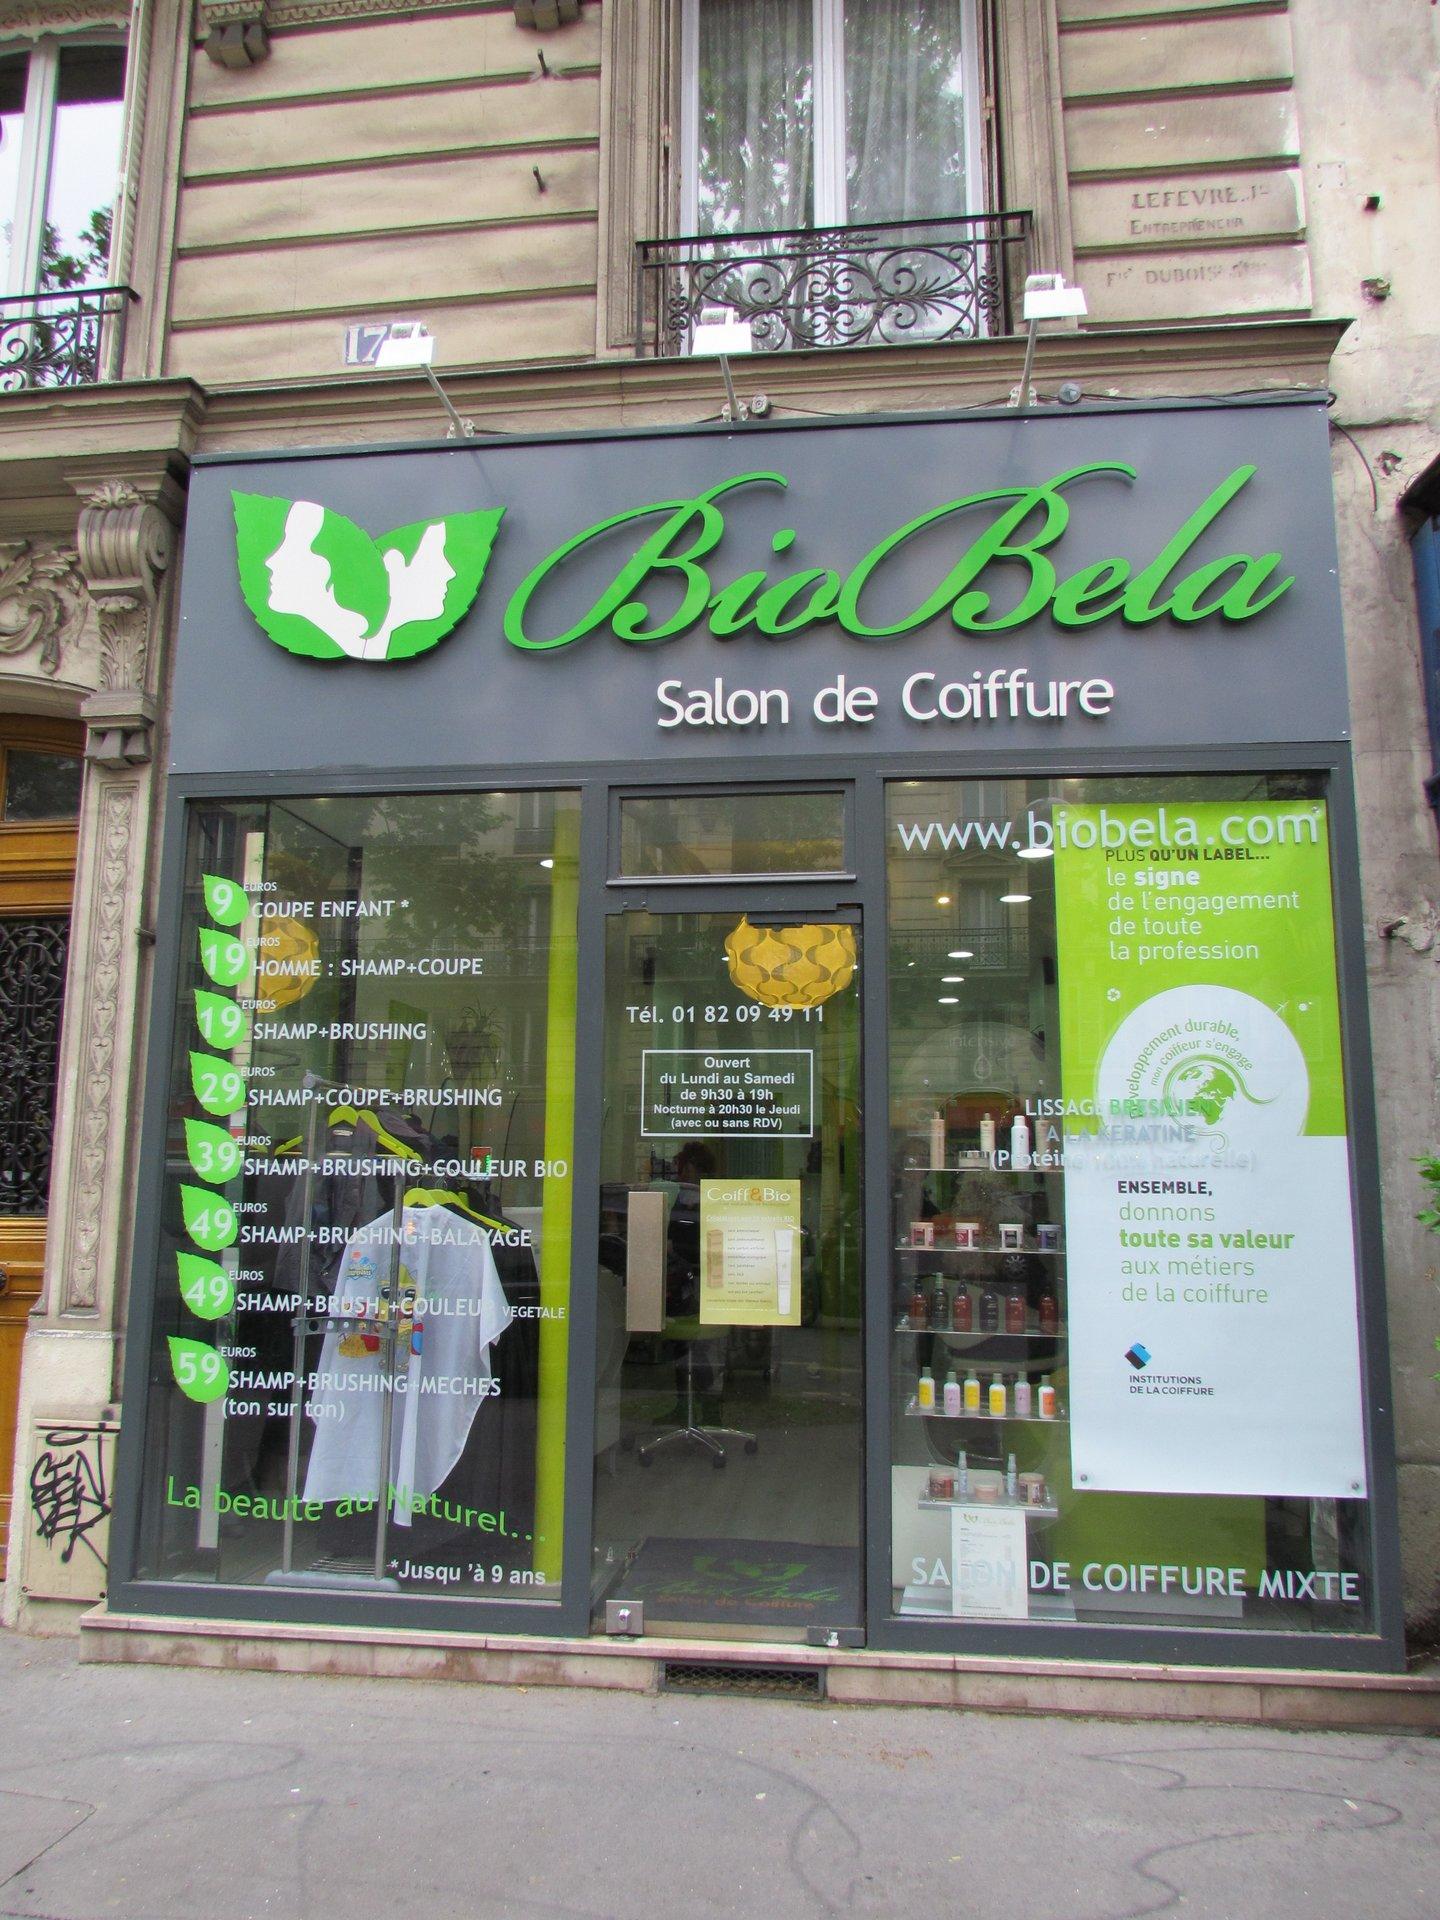 Salon de coiffure bio lendopolis for Salon de coiffure bio paris